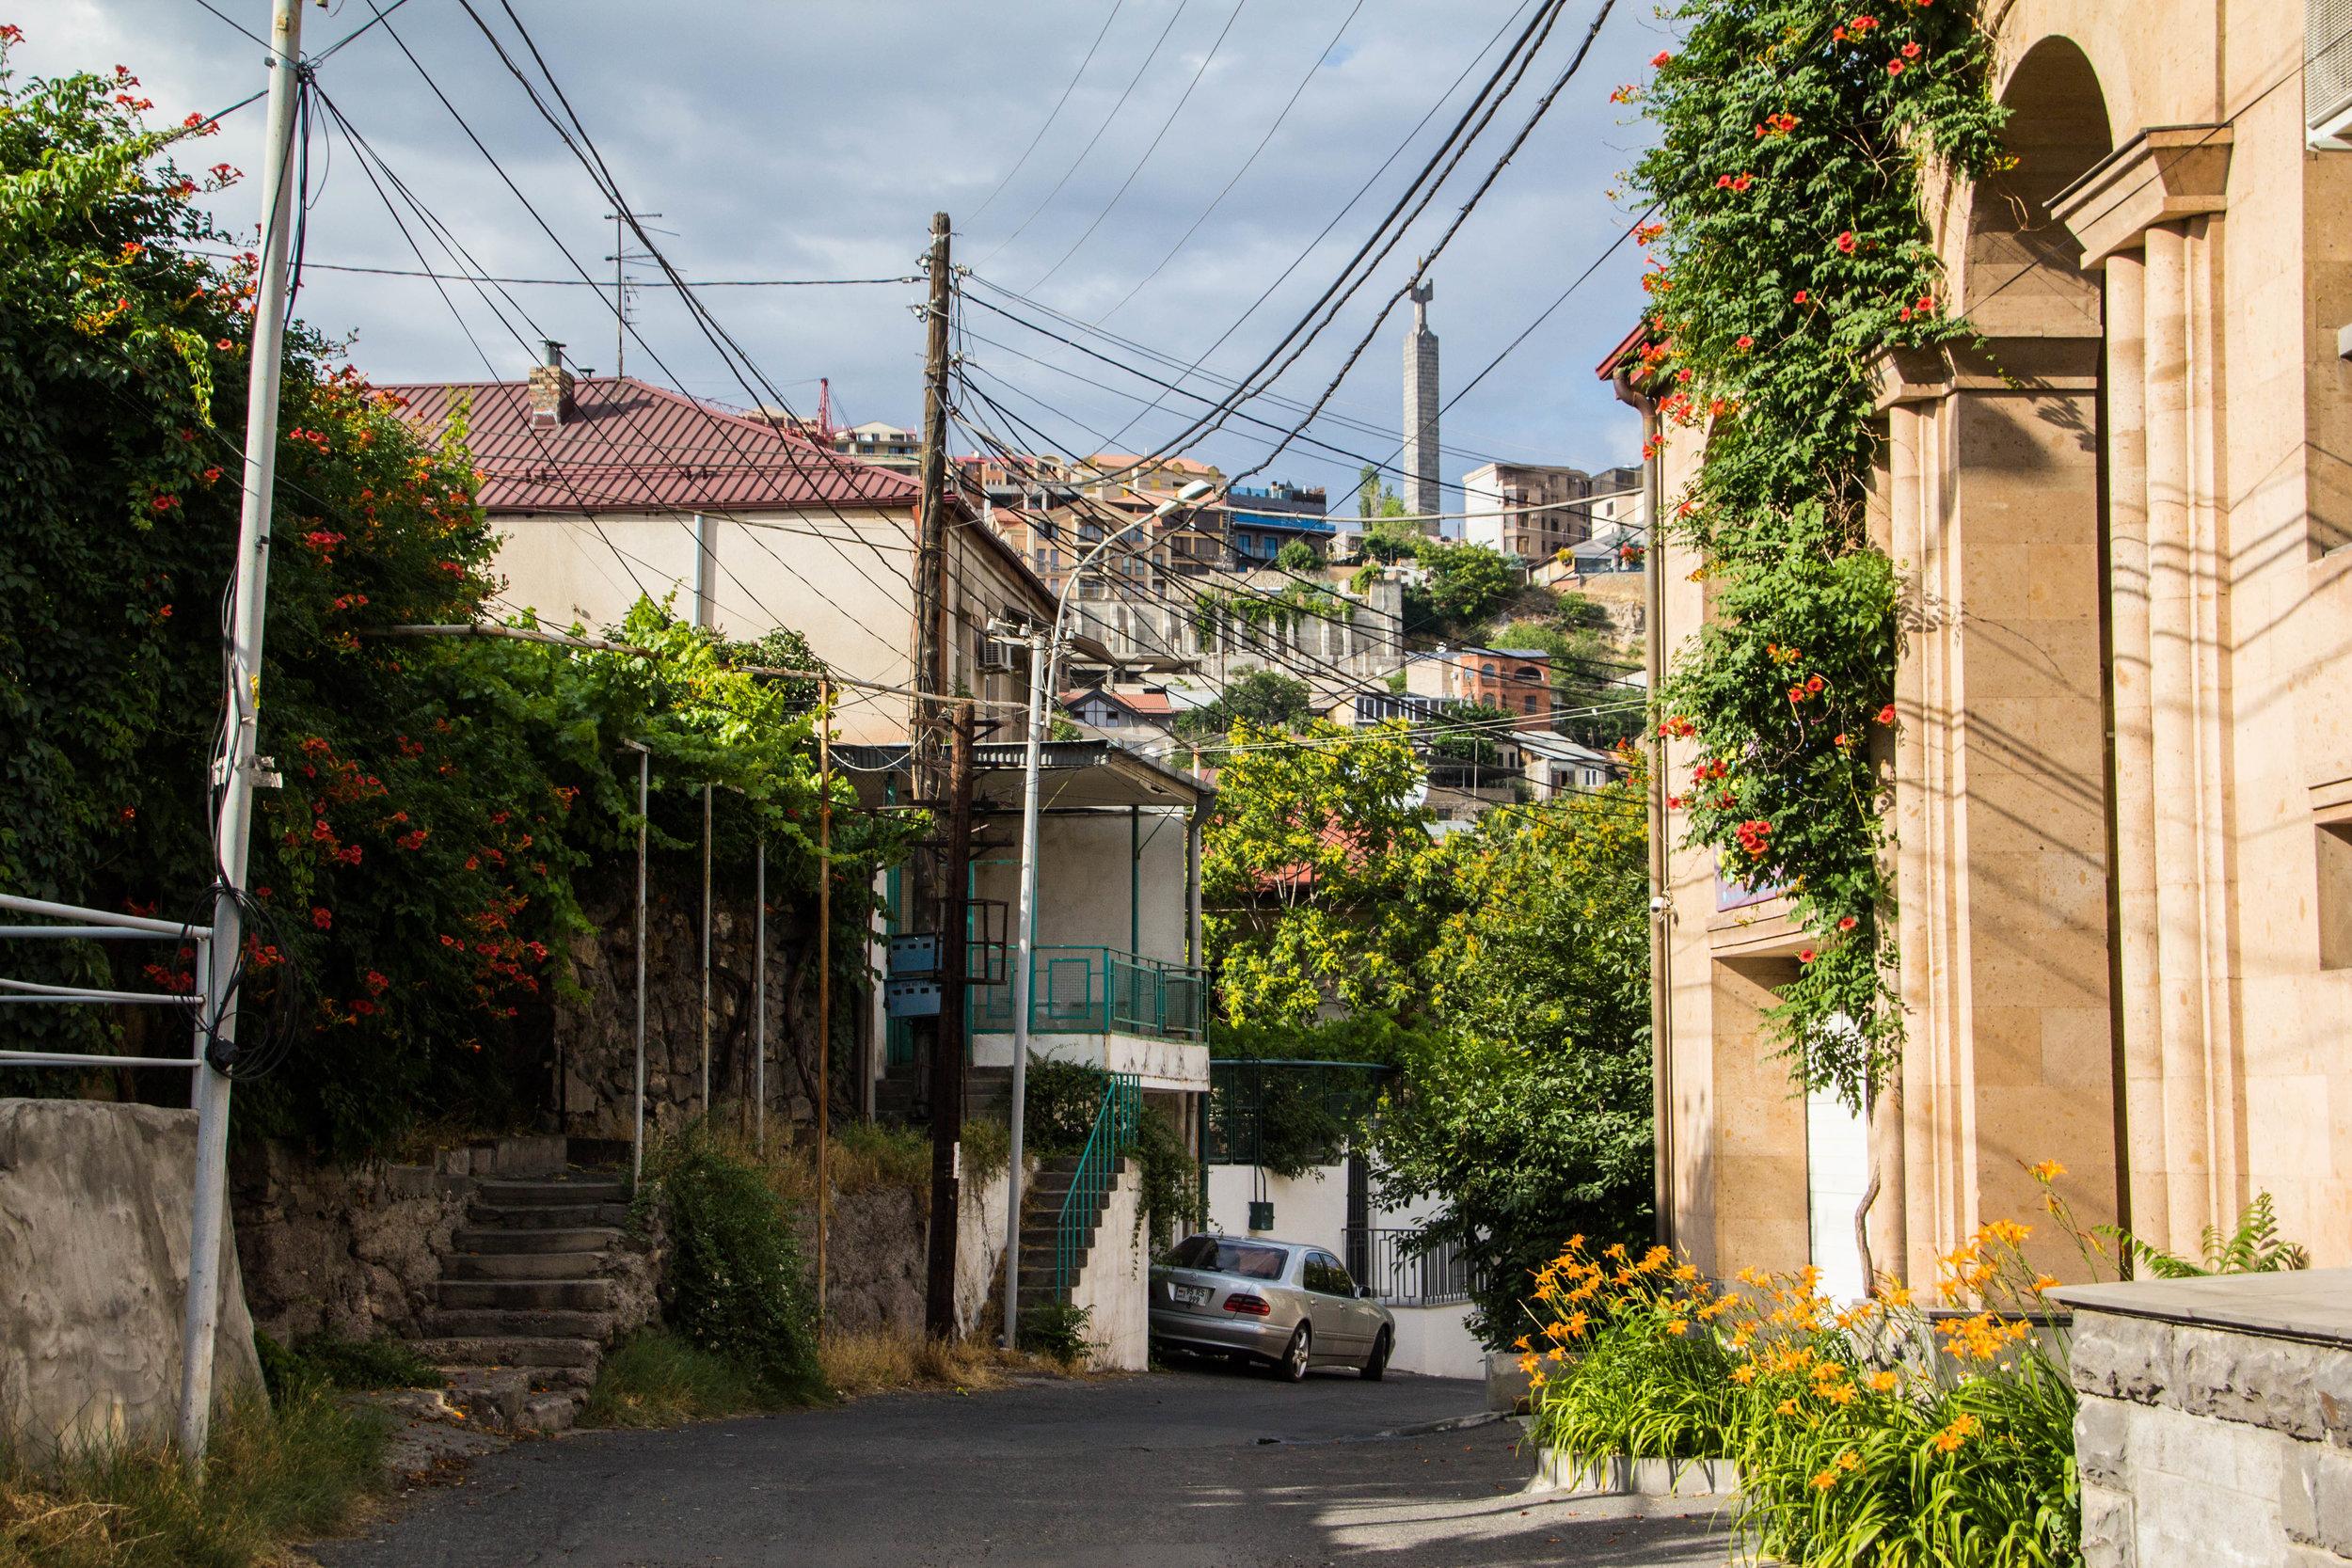 yerevan-armenia-streets-2-4.jpg